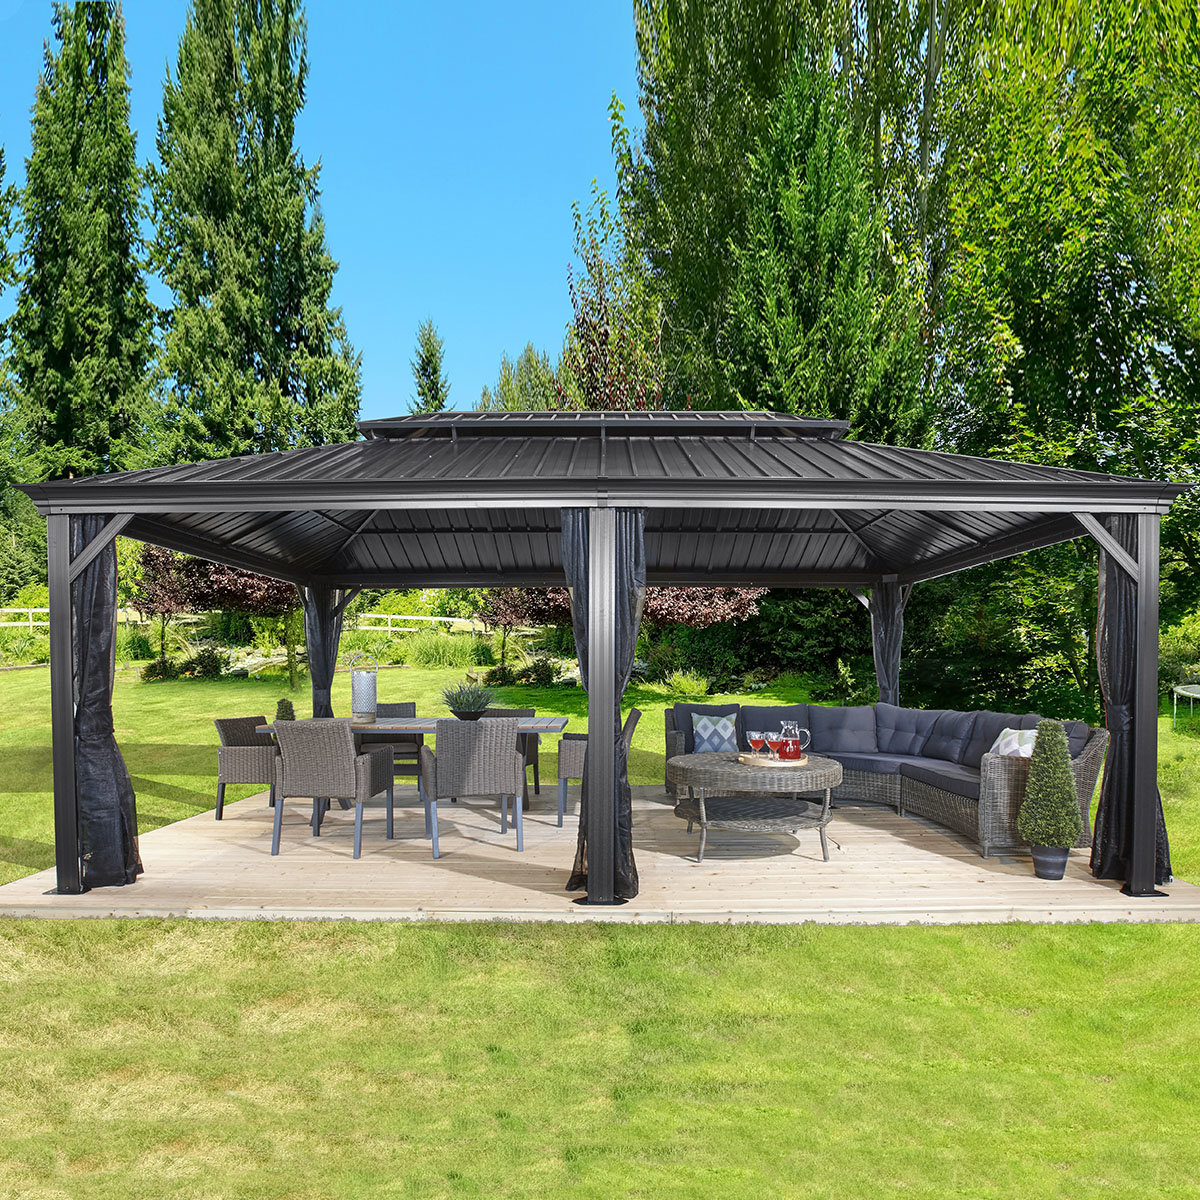 pavillon messina 12x20 online kaufen bei g rtner p tschke. Black Bedroom Furniture Sets. Home Design Ideas